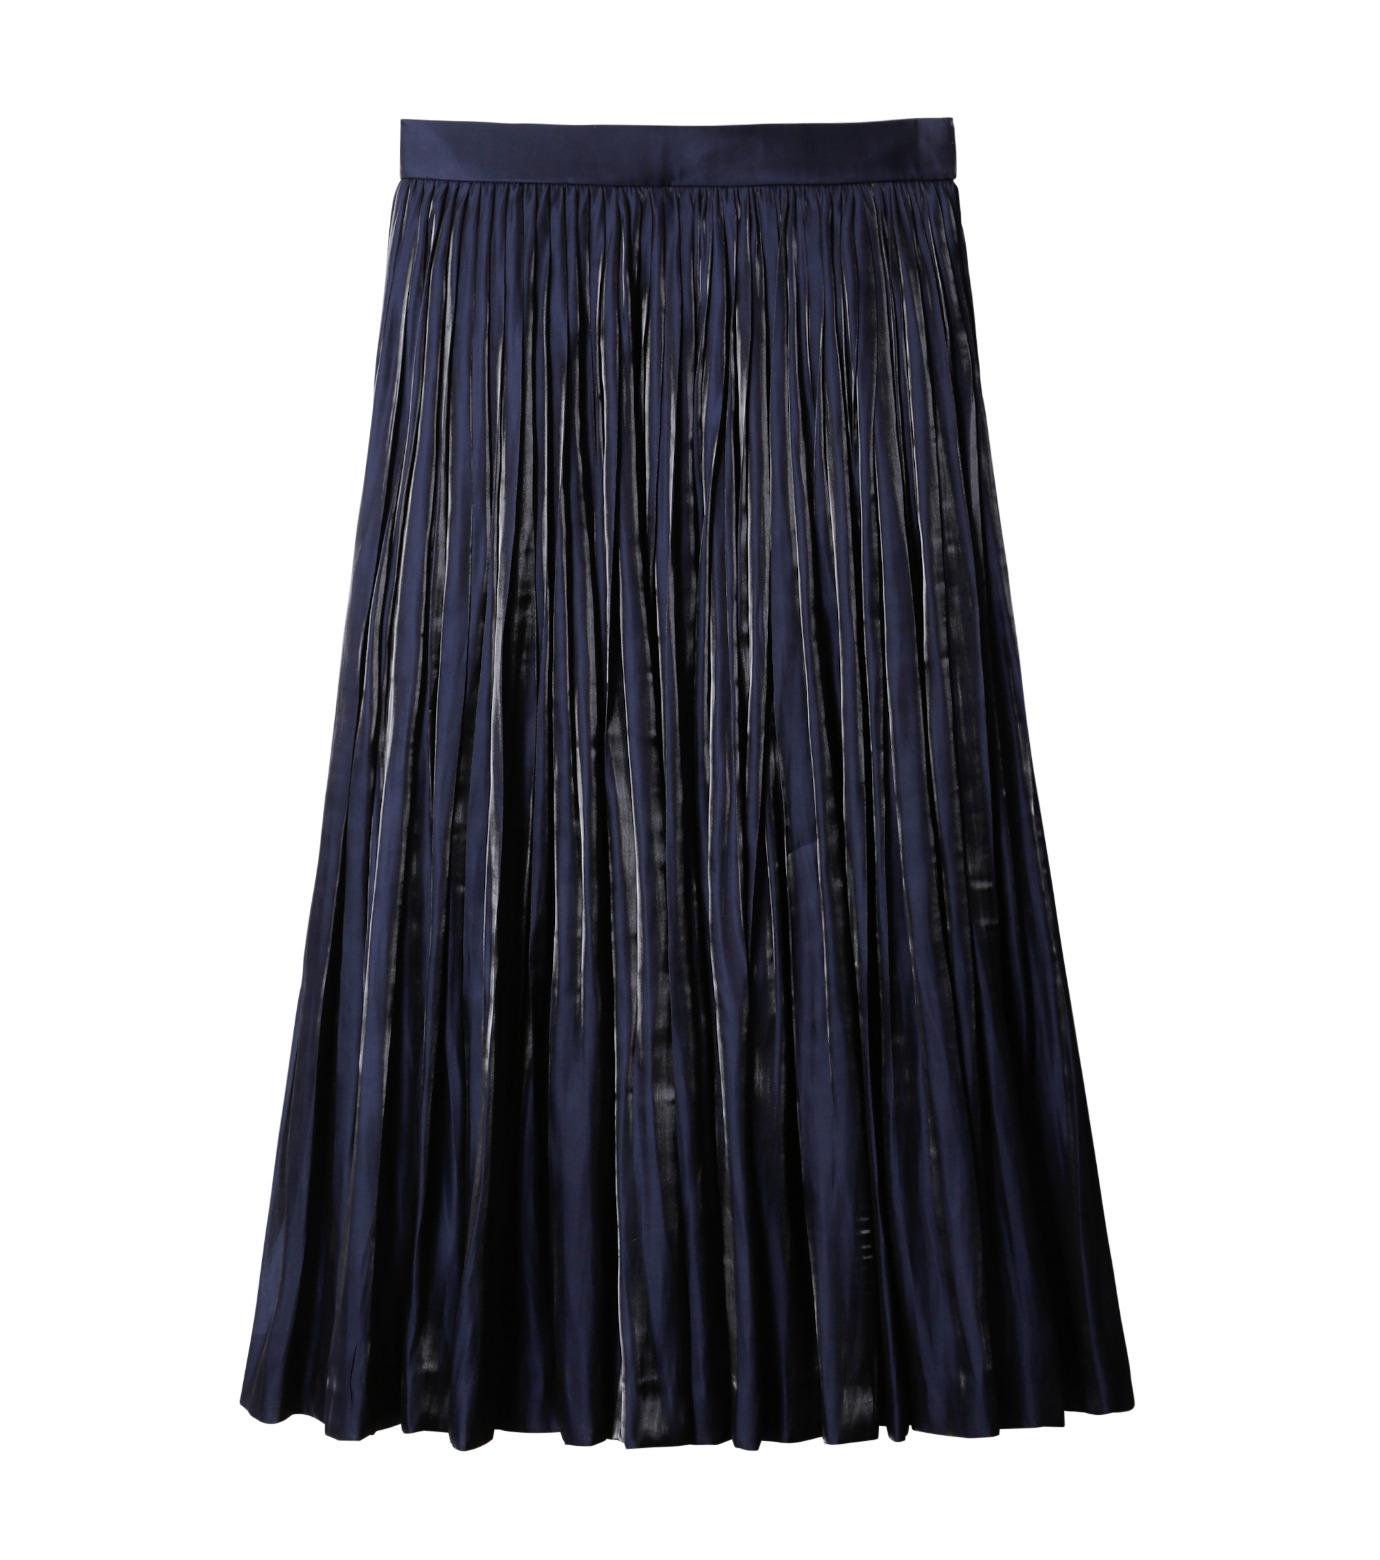 LE CIEL BLEU(ルシェルブルー)のプリーツスカート-NAVY(スカート/skirt)-18A67206 拡大詳細画像4